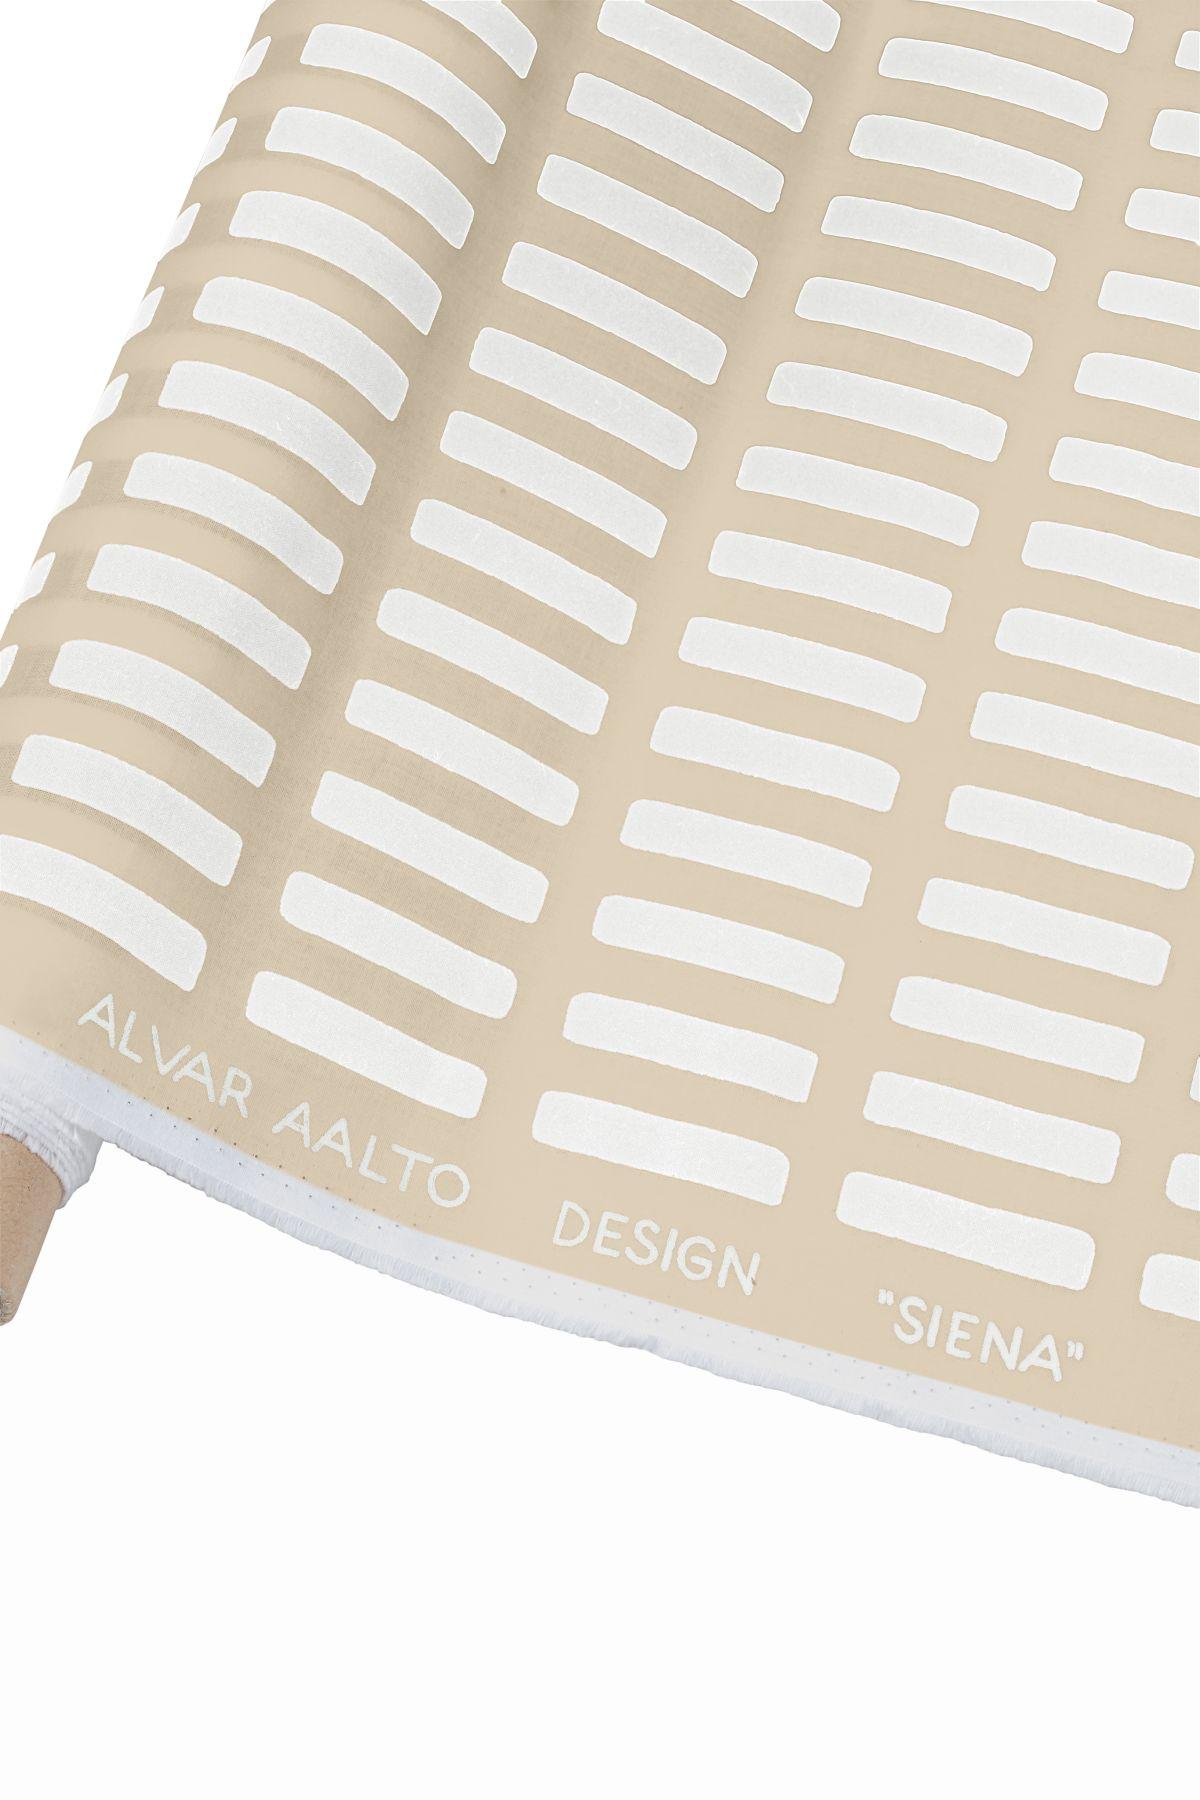 Siena-Fabric-sand-white-3976840